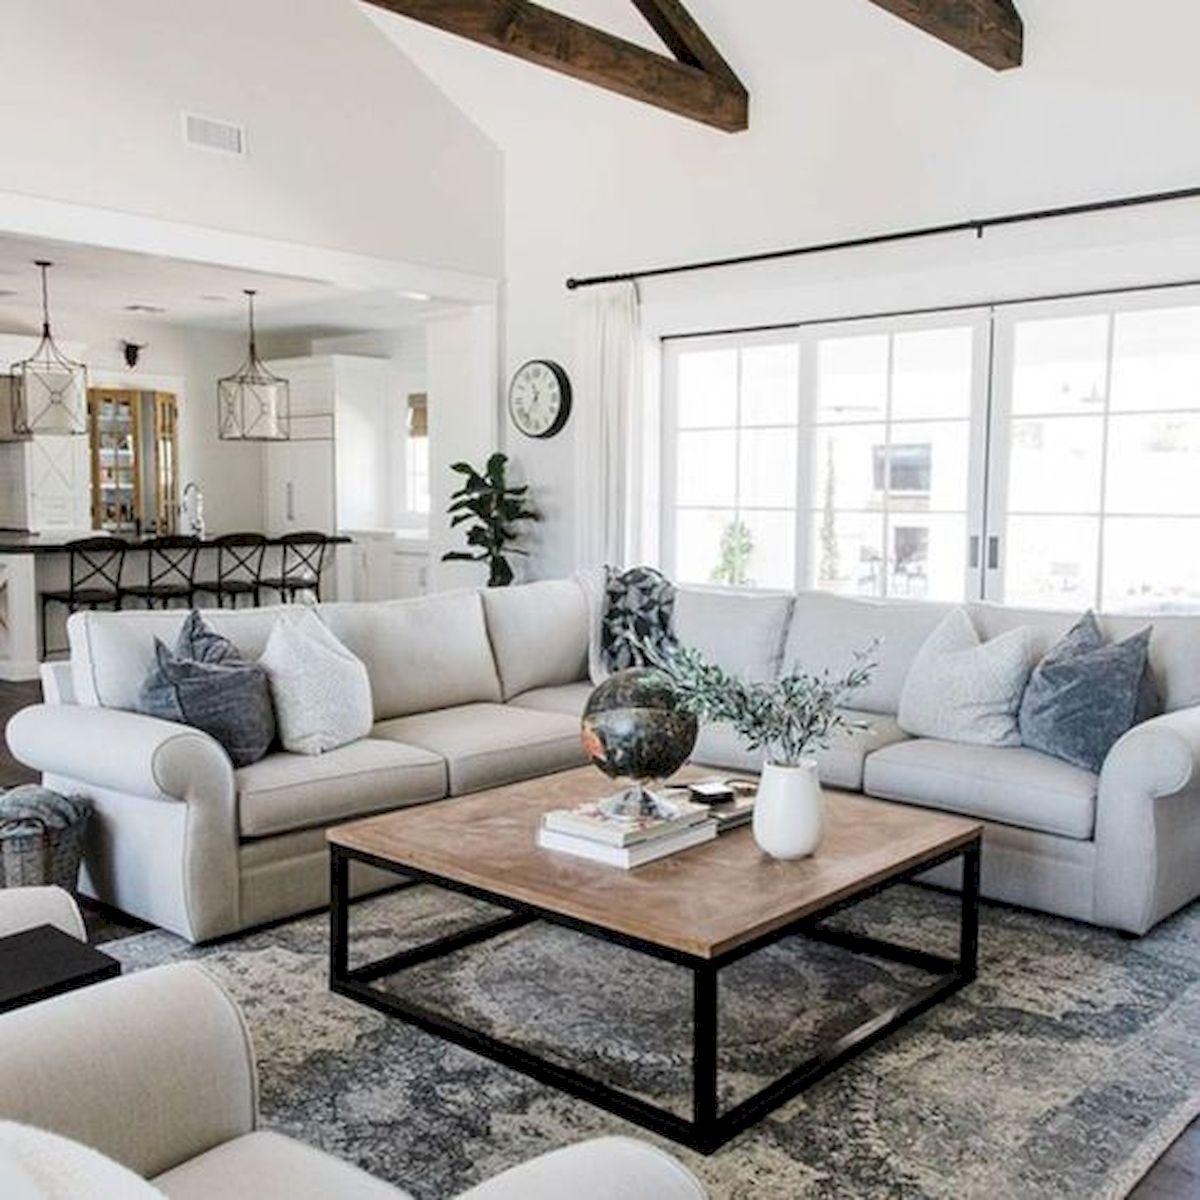 50 Gorgeous Living Room Decor and Design Ideas (45)